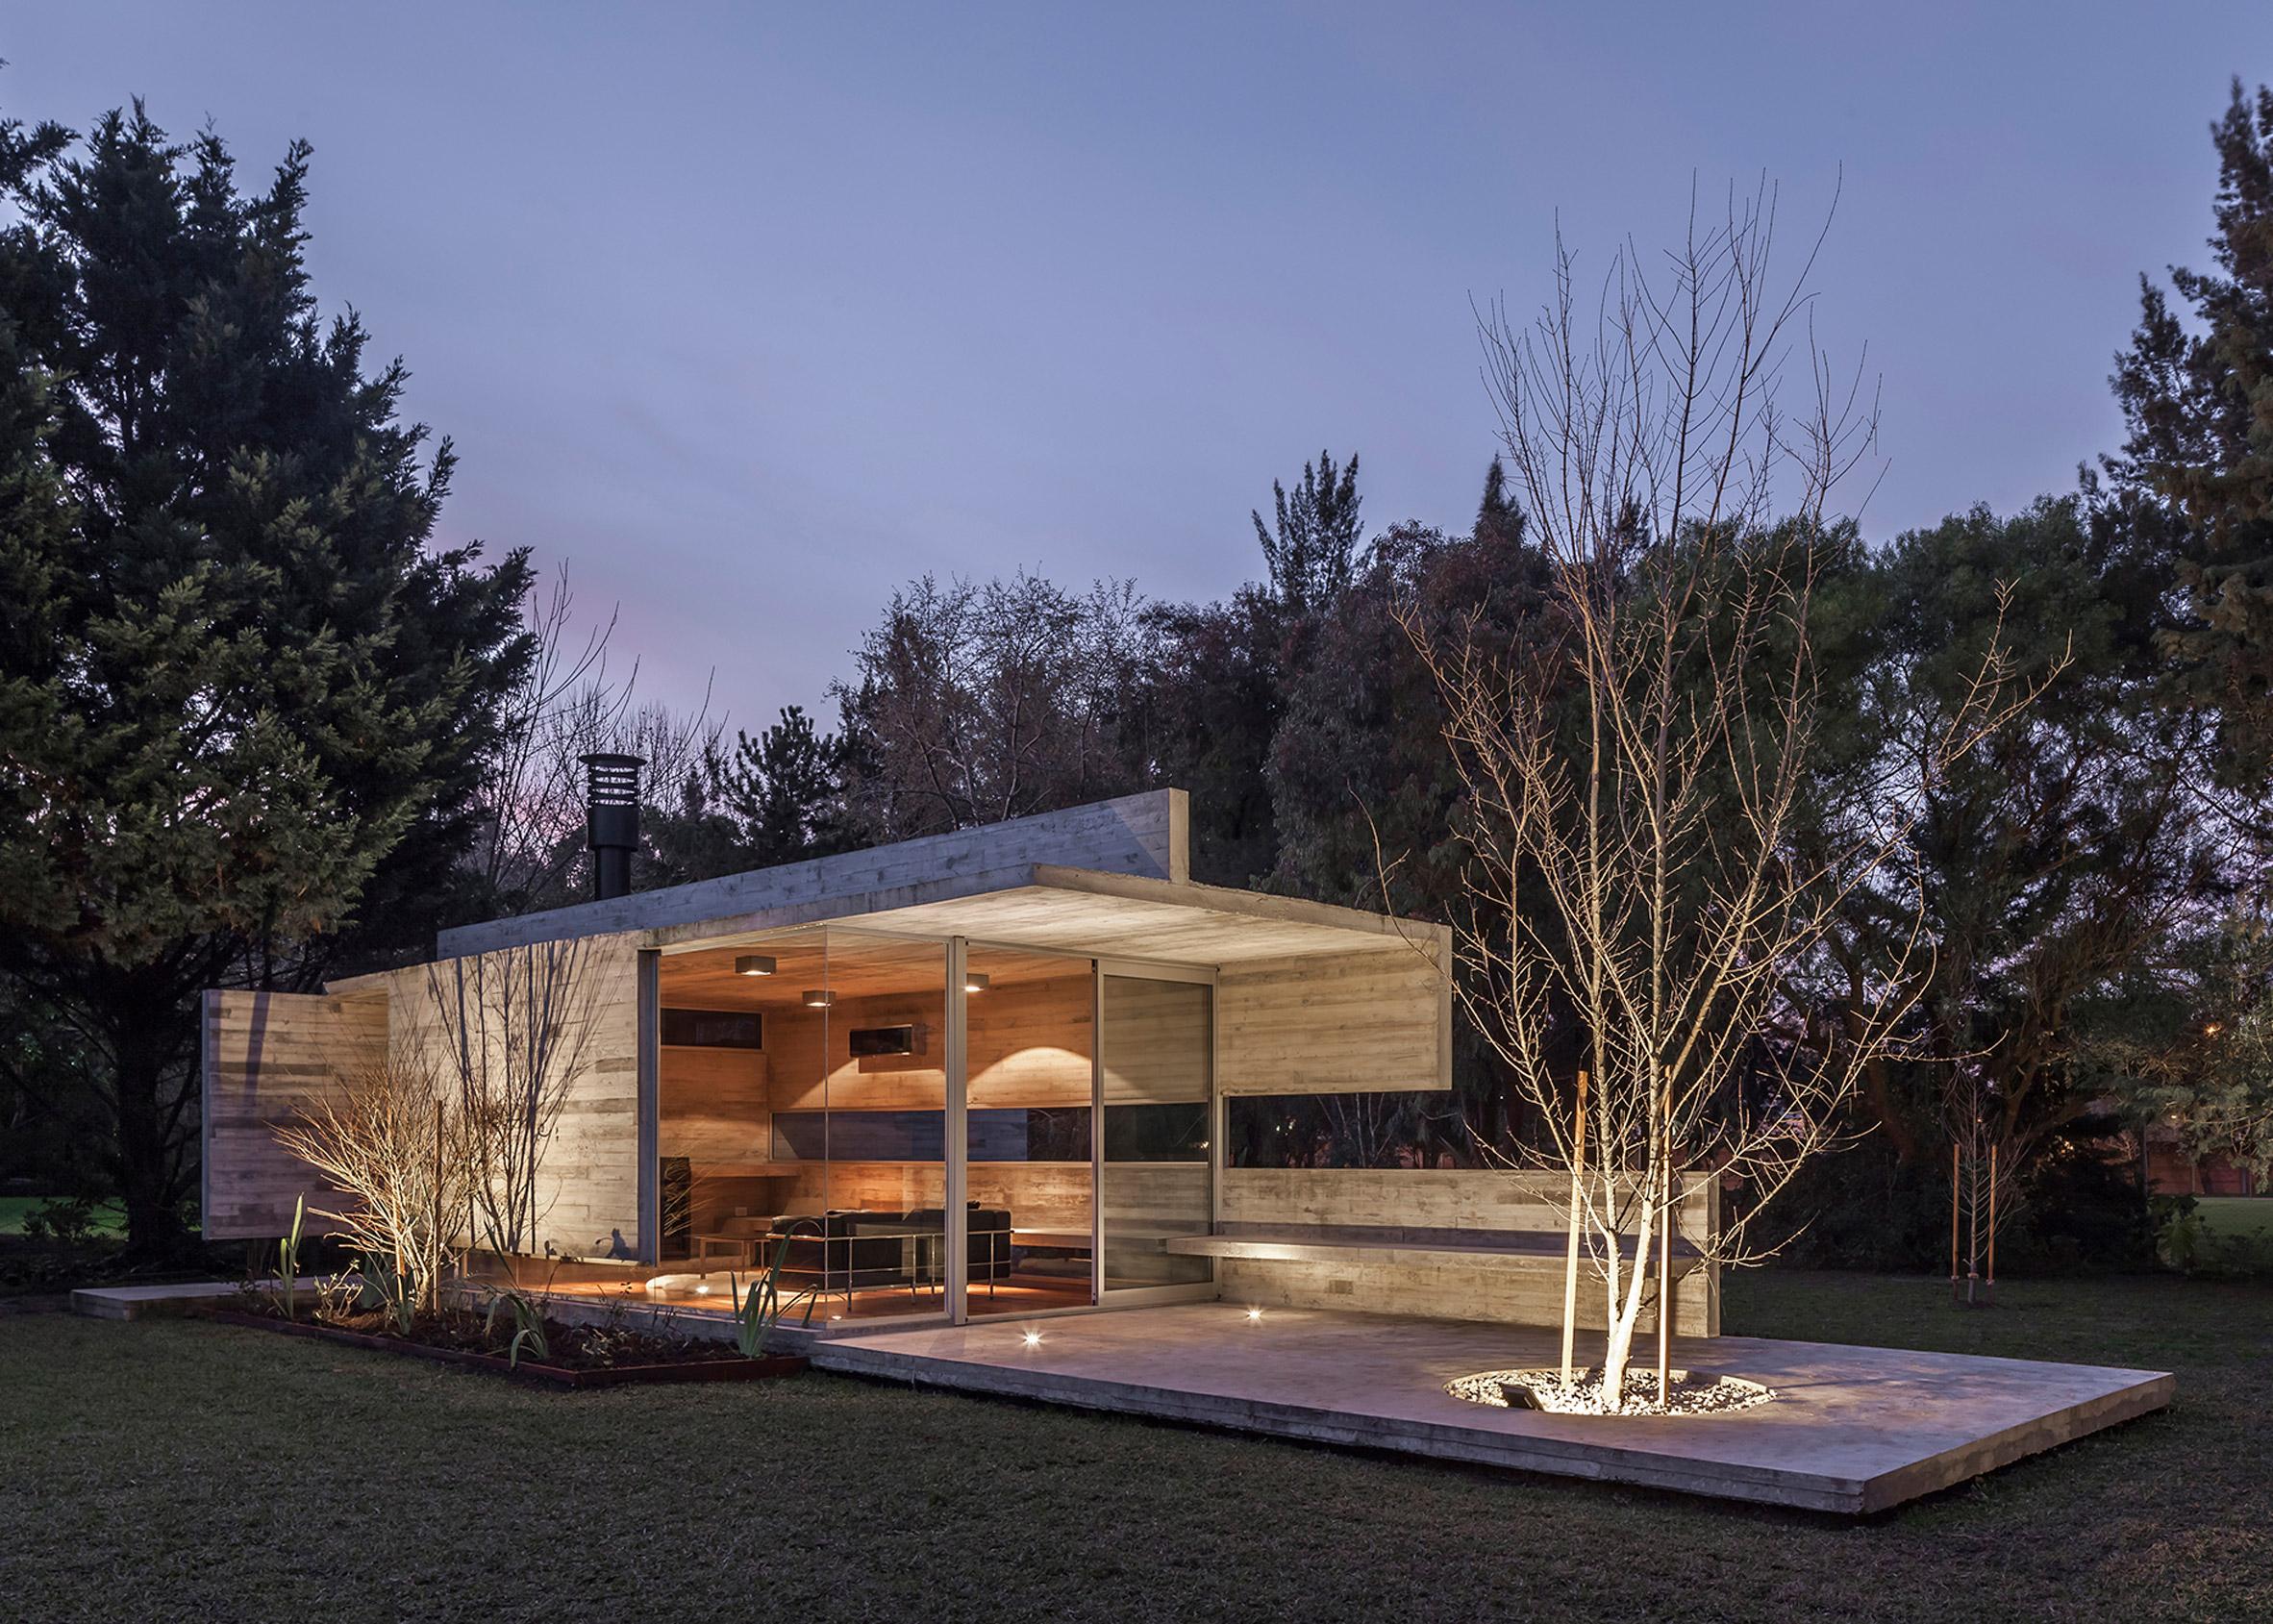 Torcuato House Pavilion by Besonías Almeida